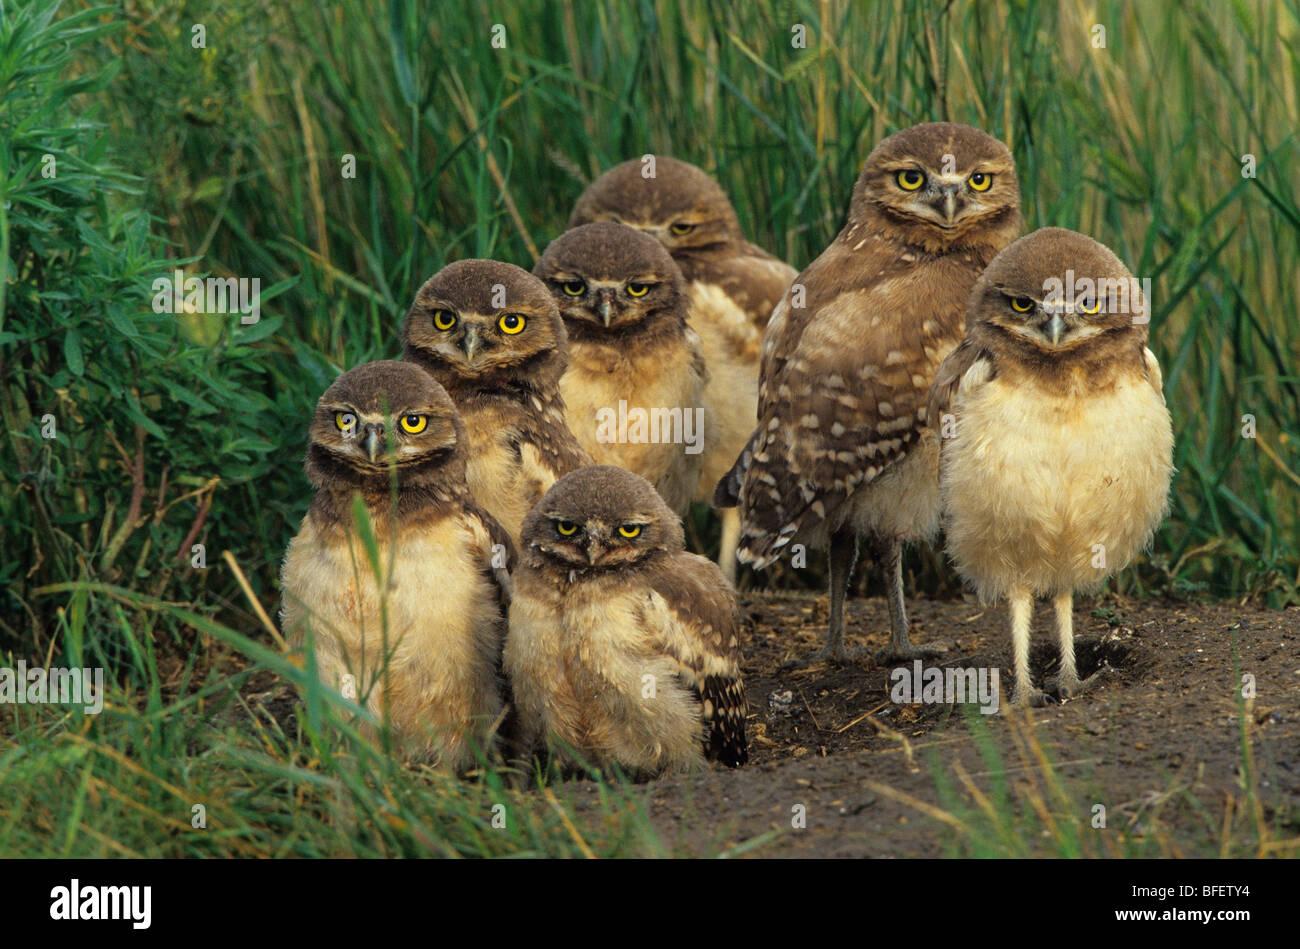 Burrowing owl (Athene cunicularia) chicks at nest burrow near Grasslands National Park, Saskatchewan, Canada Stock Photo